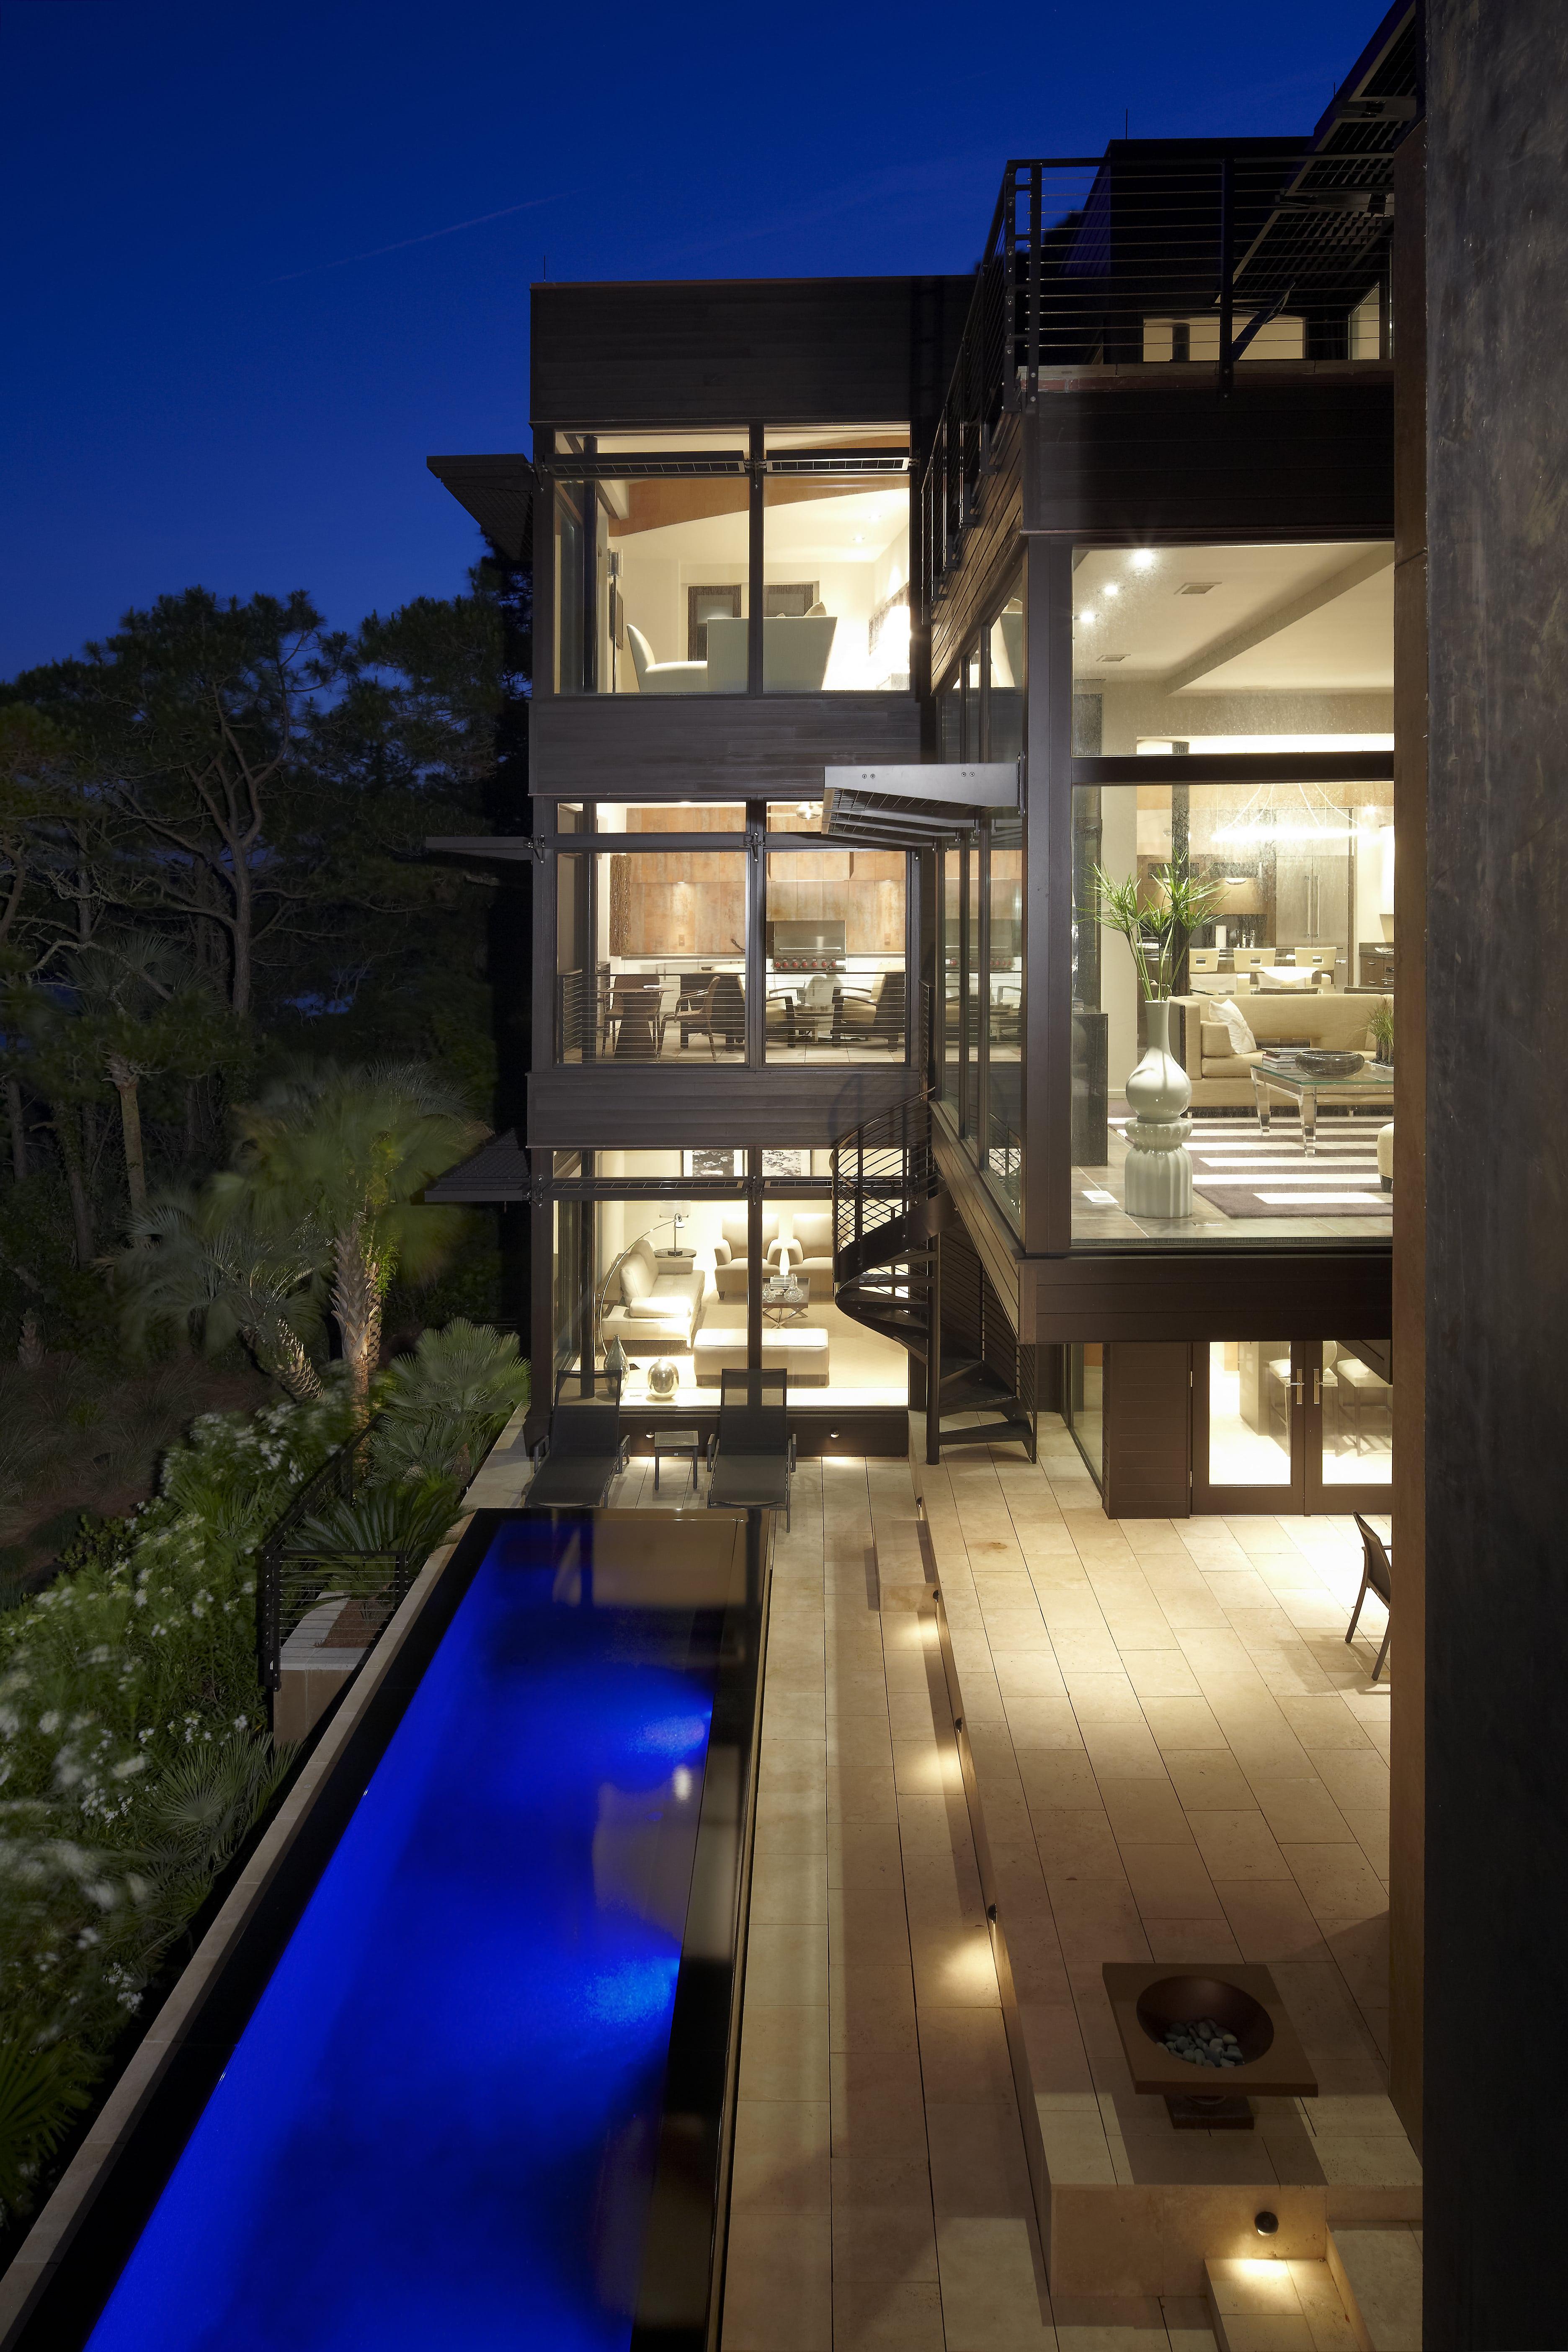 Modern House Image-min